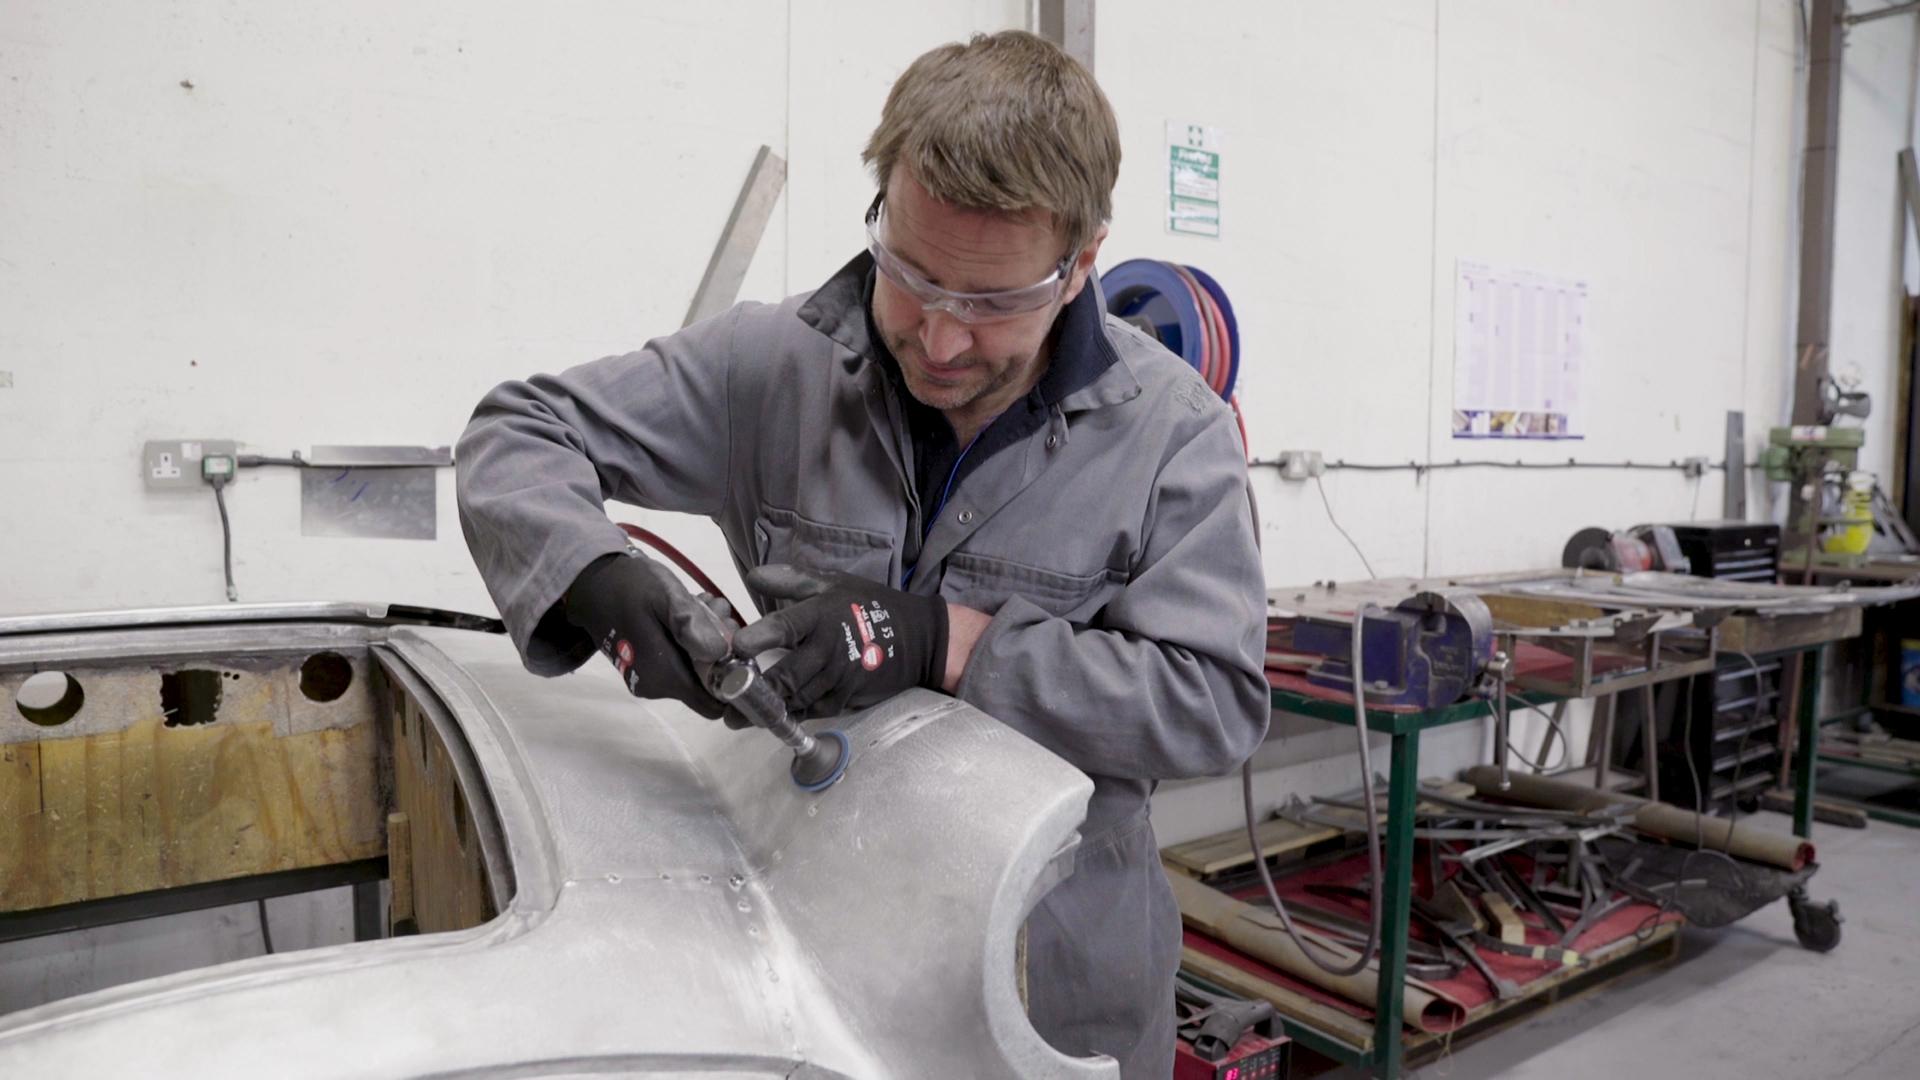 Screenshot from corporate film. Working on aluminium Austin Healey shroud